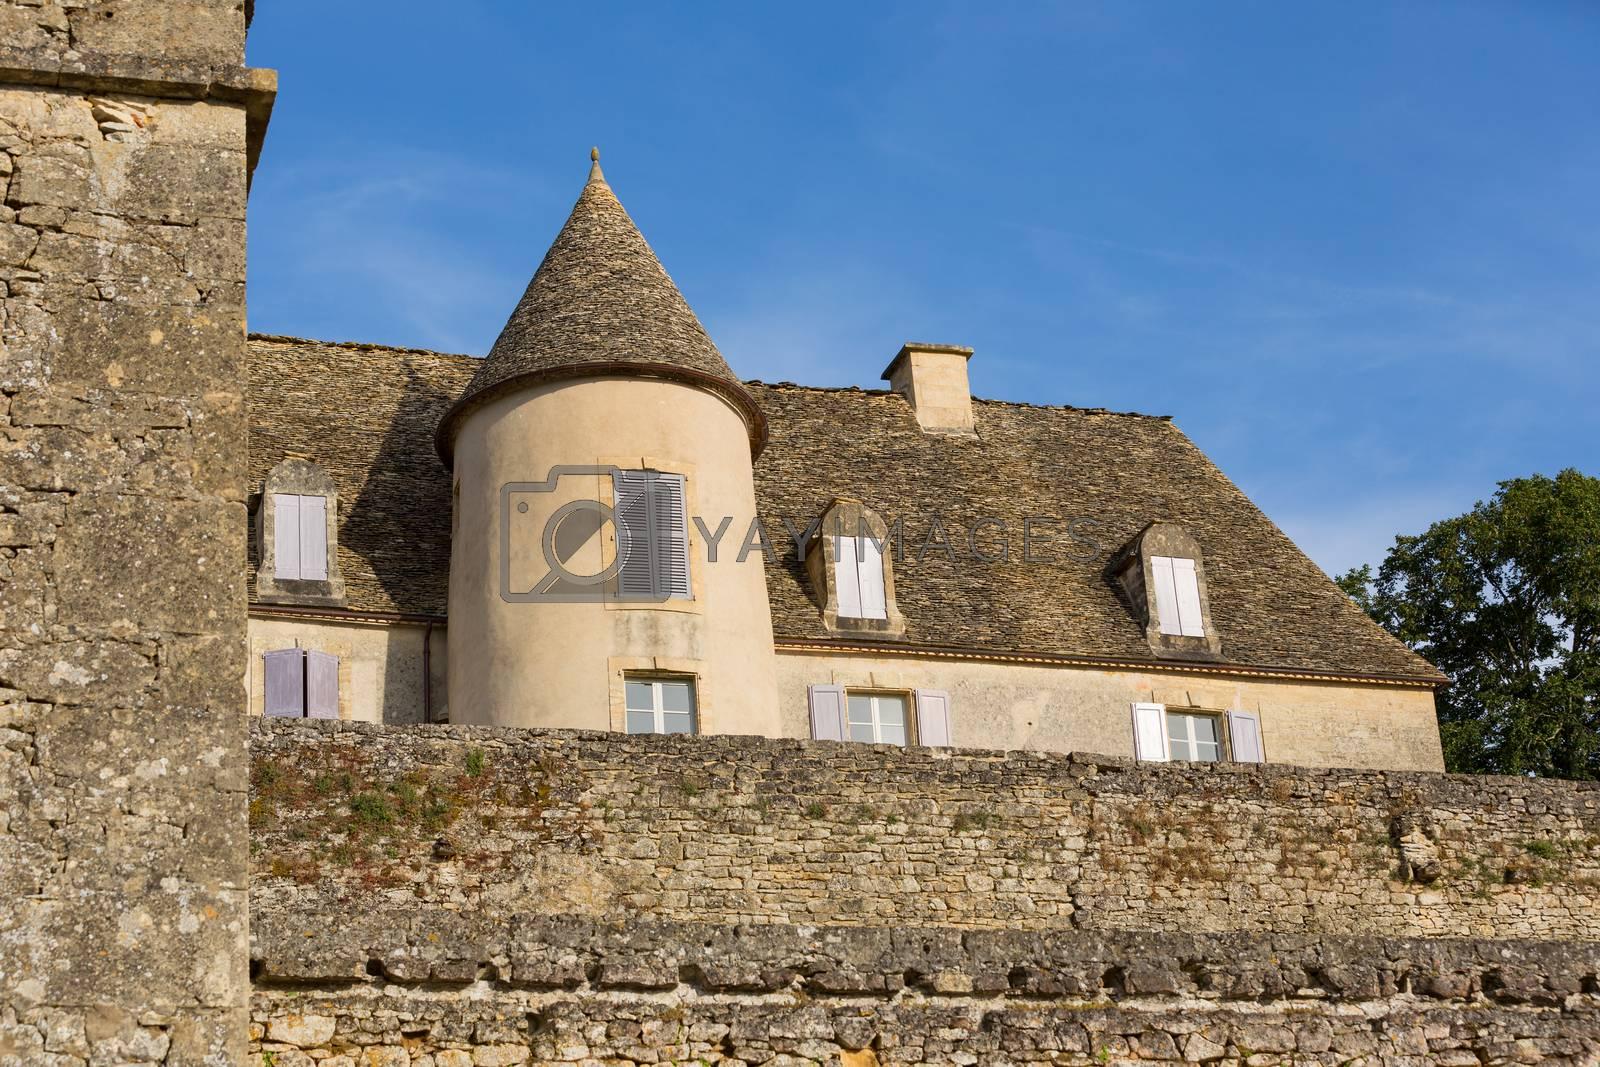 Dordogne, France: The Castle of the gardens of the Jardins de Marqueyssac in the Dordogne region of France